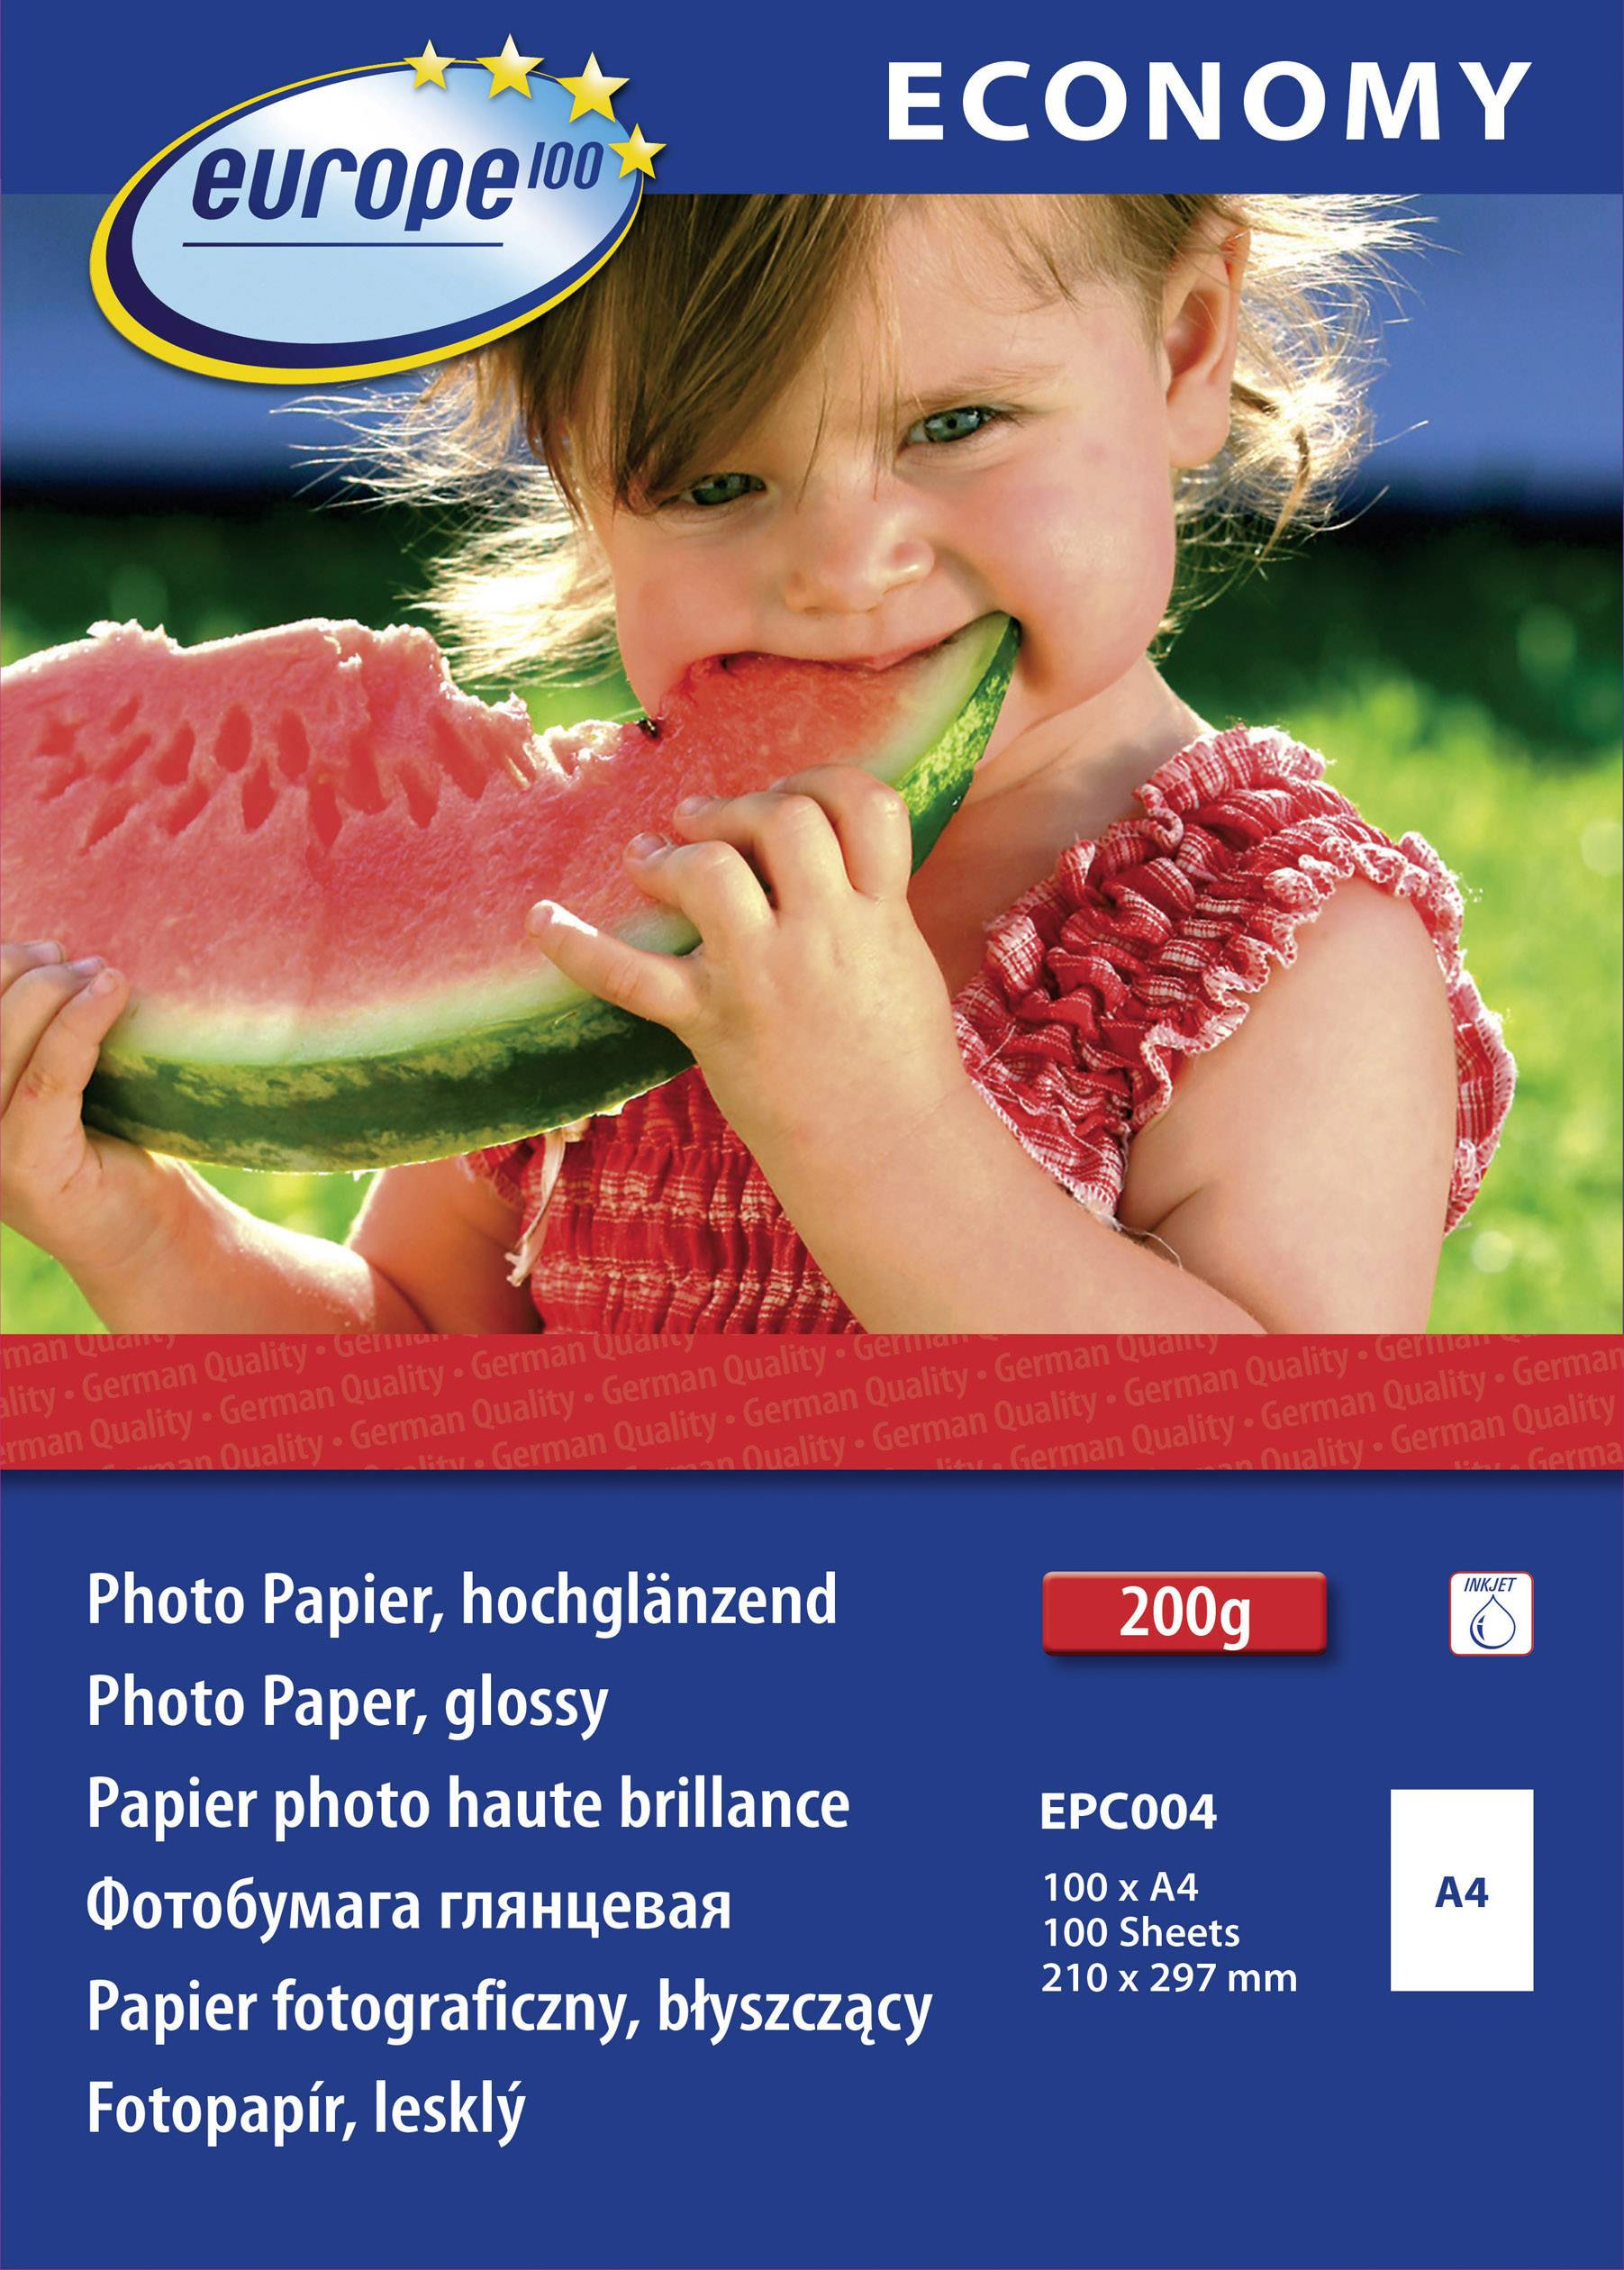 Fotografický papier Europe 100 Economy Photo Paper Glossy EPC004, A4, 210 gm², 100 listov